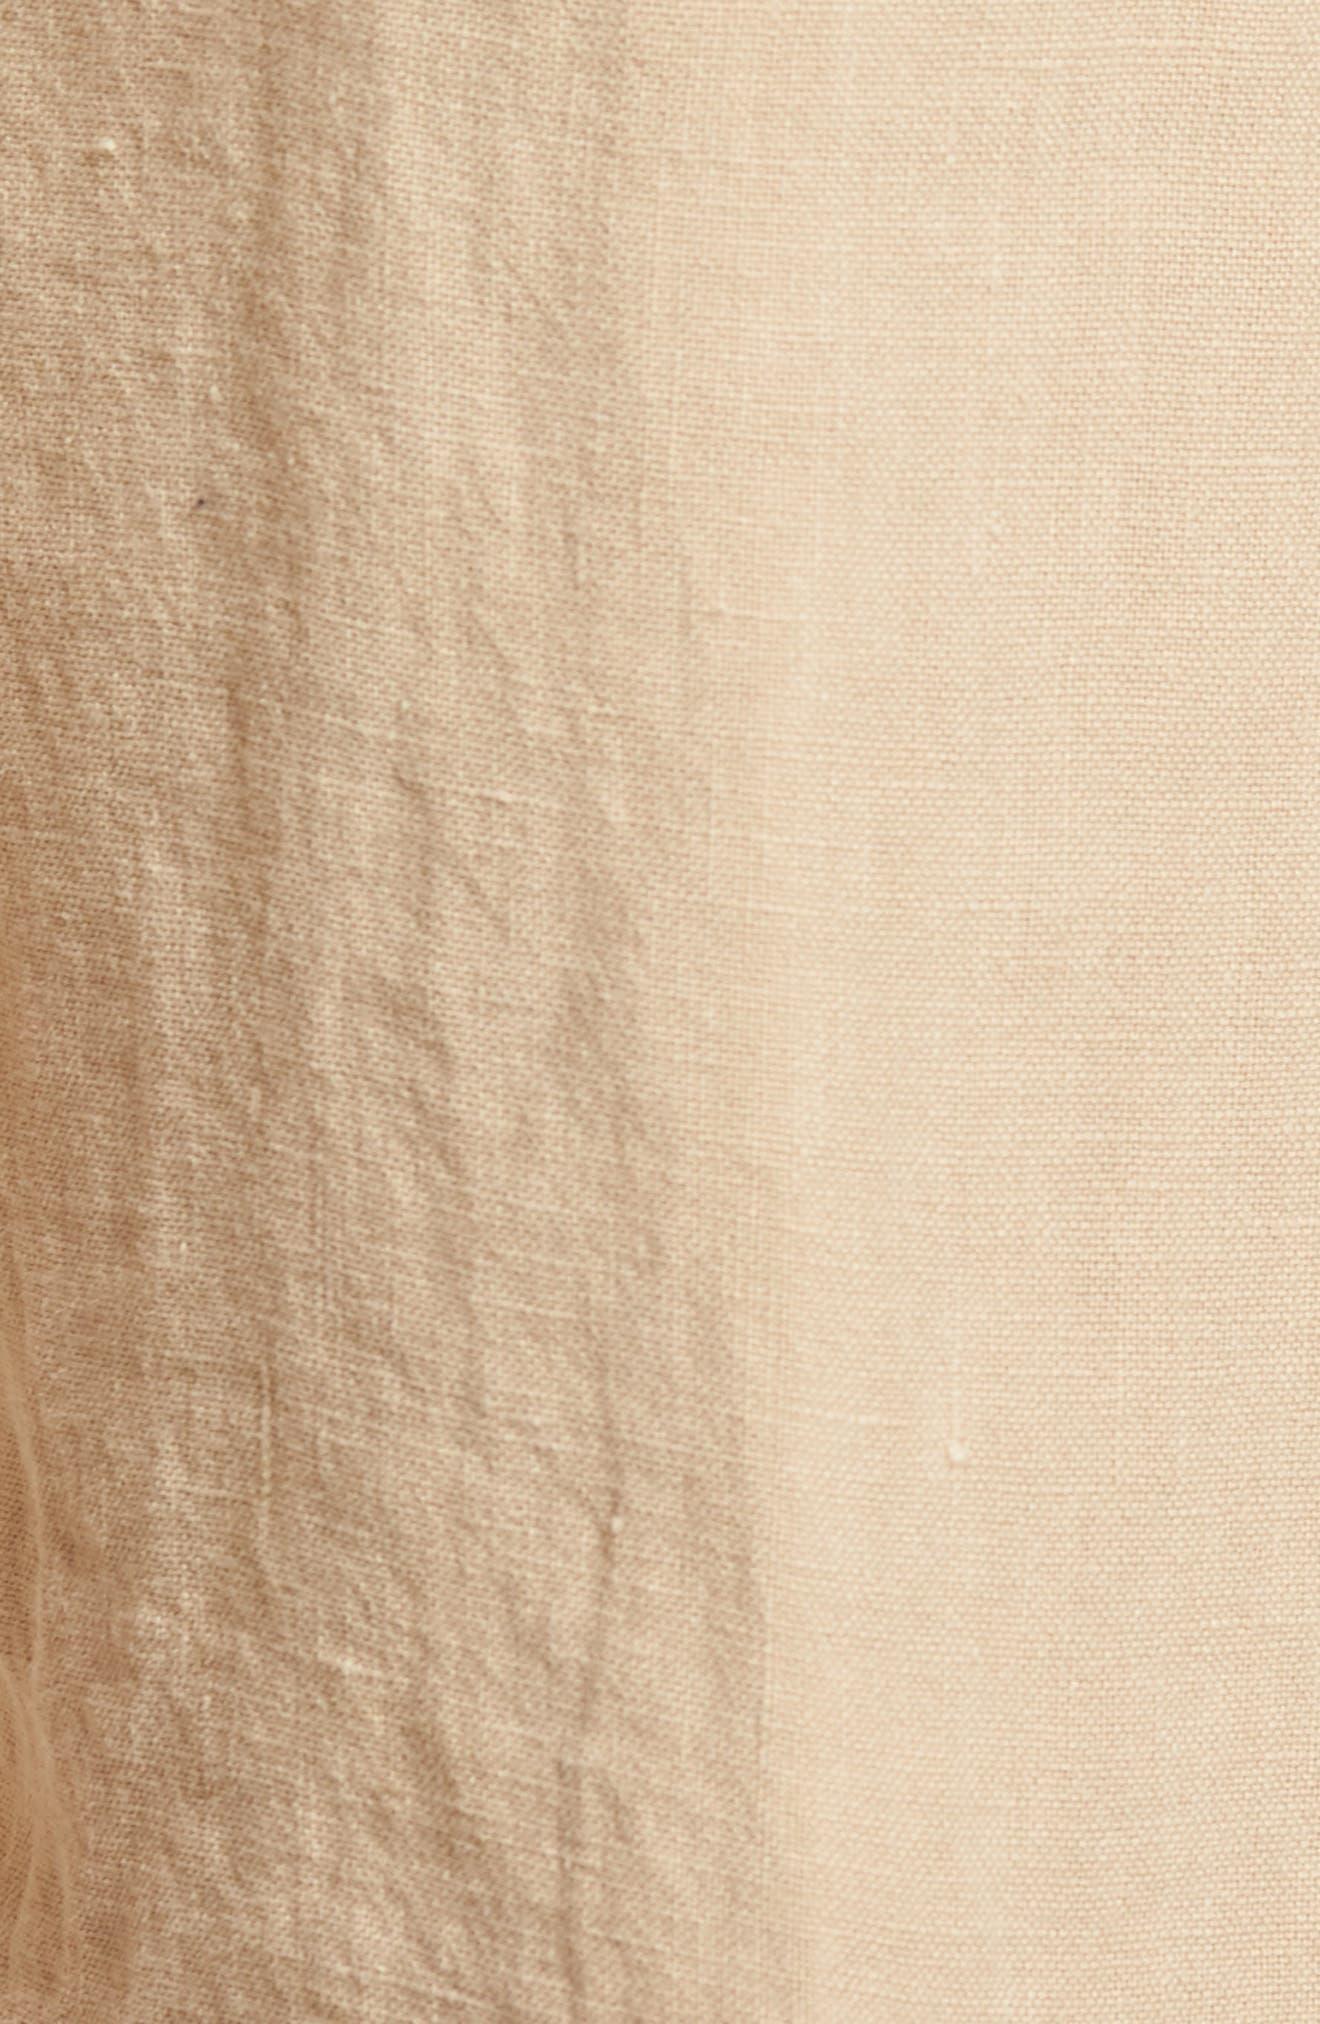 & Bros. Linen Shorts,                             Alternate thumbnail 5, color,                             200